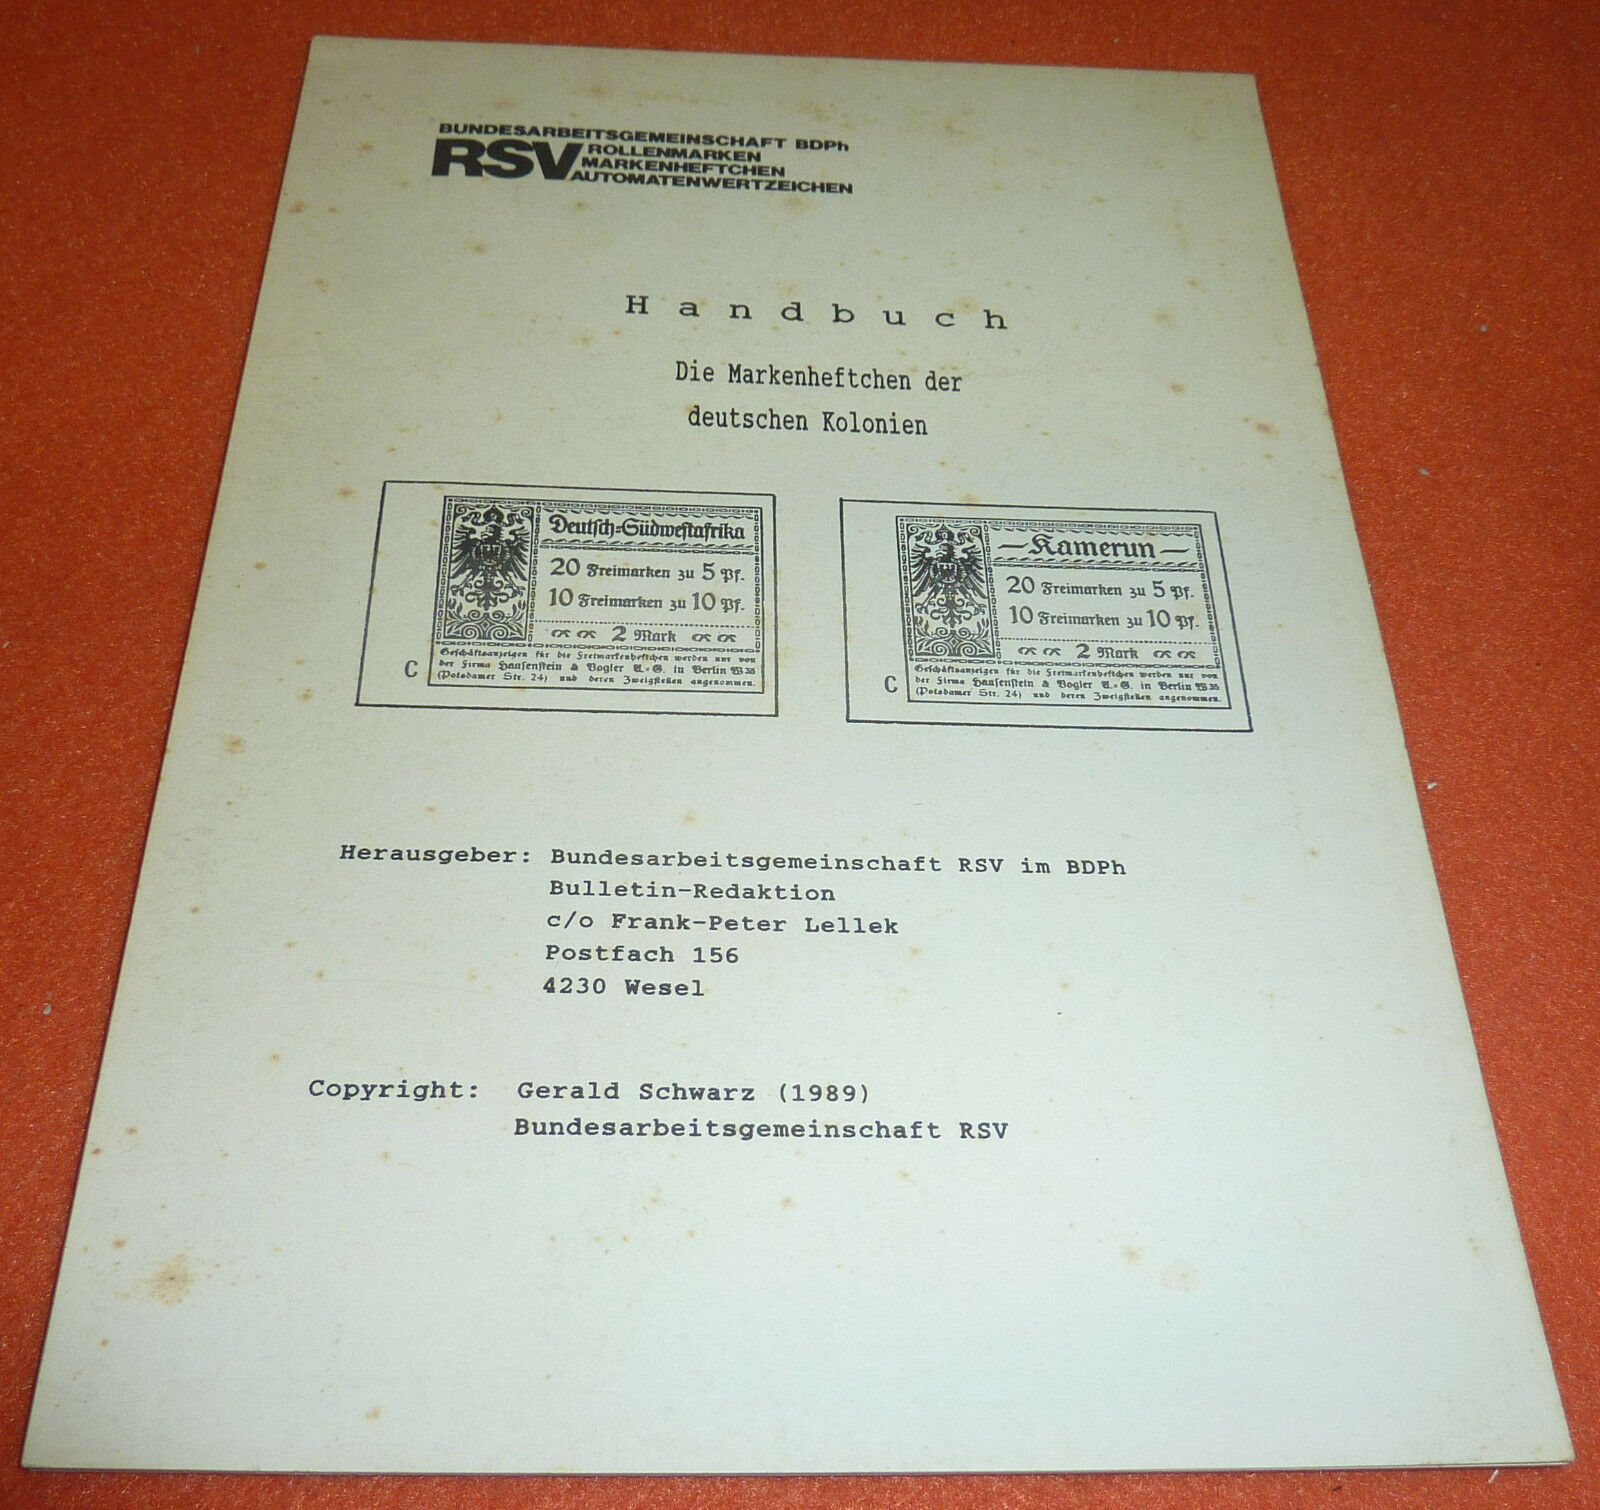 Markenheftchen Deutsche Kolonien Spezial Katalog & Handbuch DOA DSWA Kamerun etc